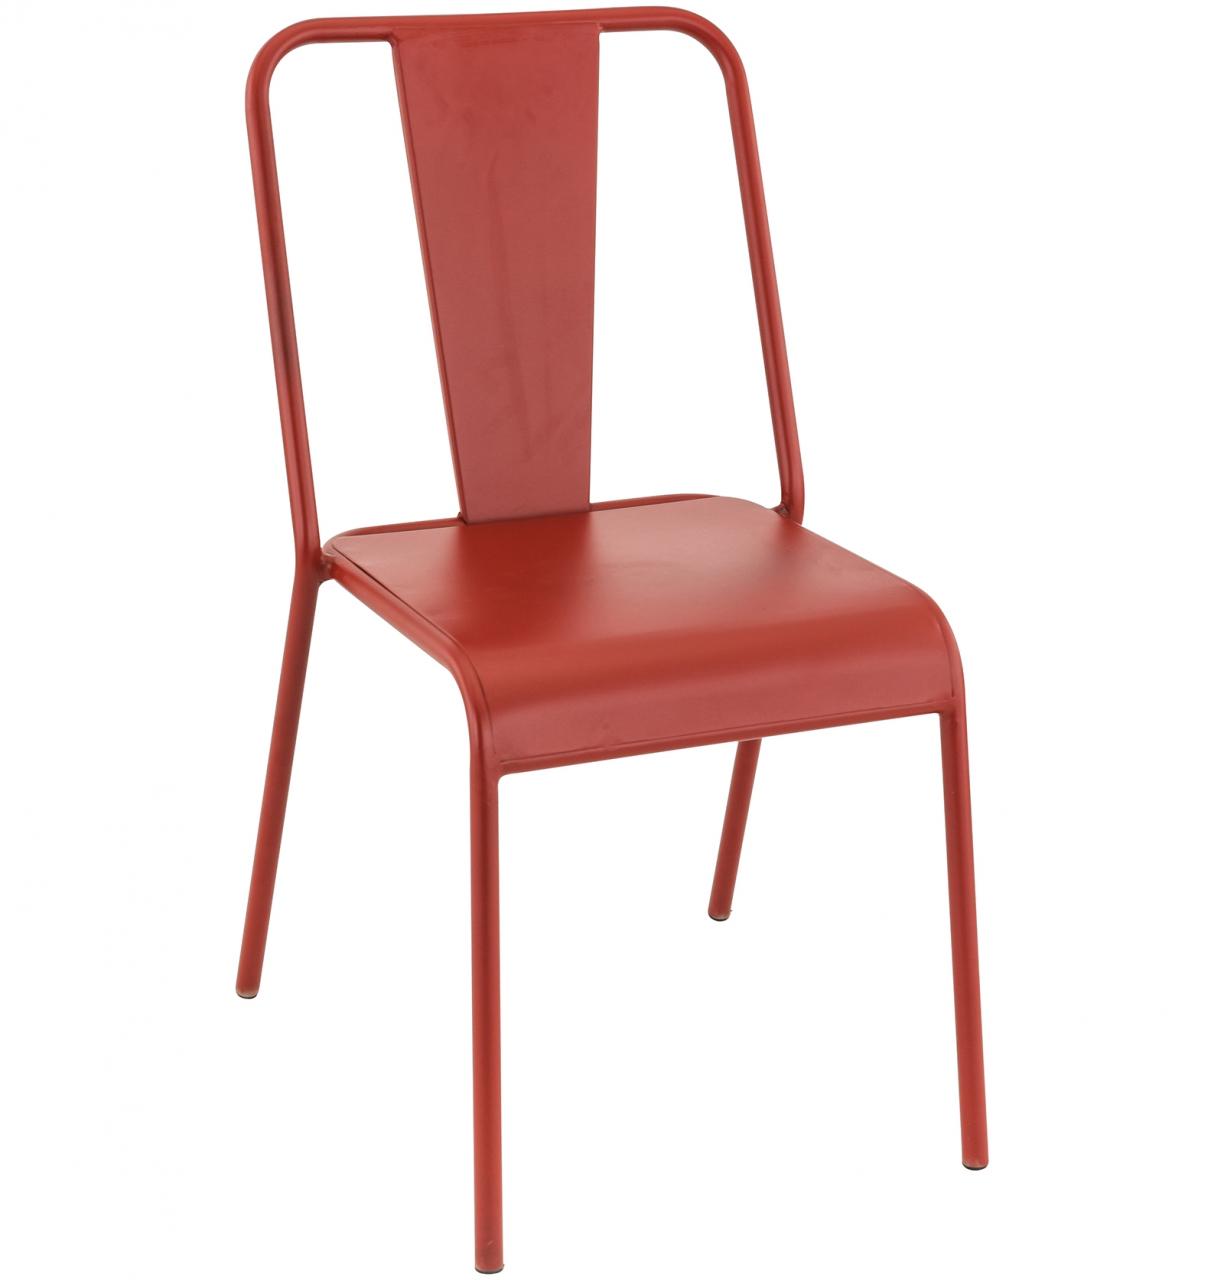 Mobilier coulomb chaise de terrasse m tal rivoli for Chaise de terrasse occasion